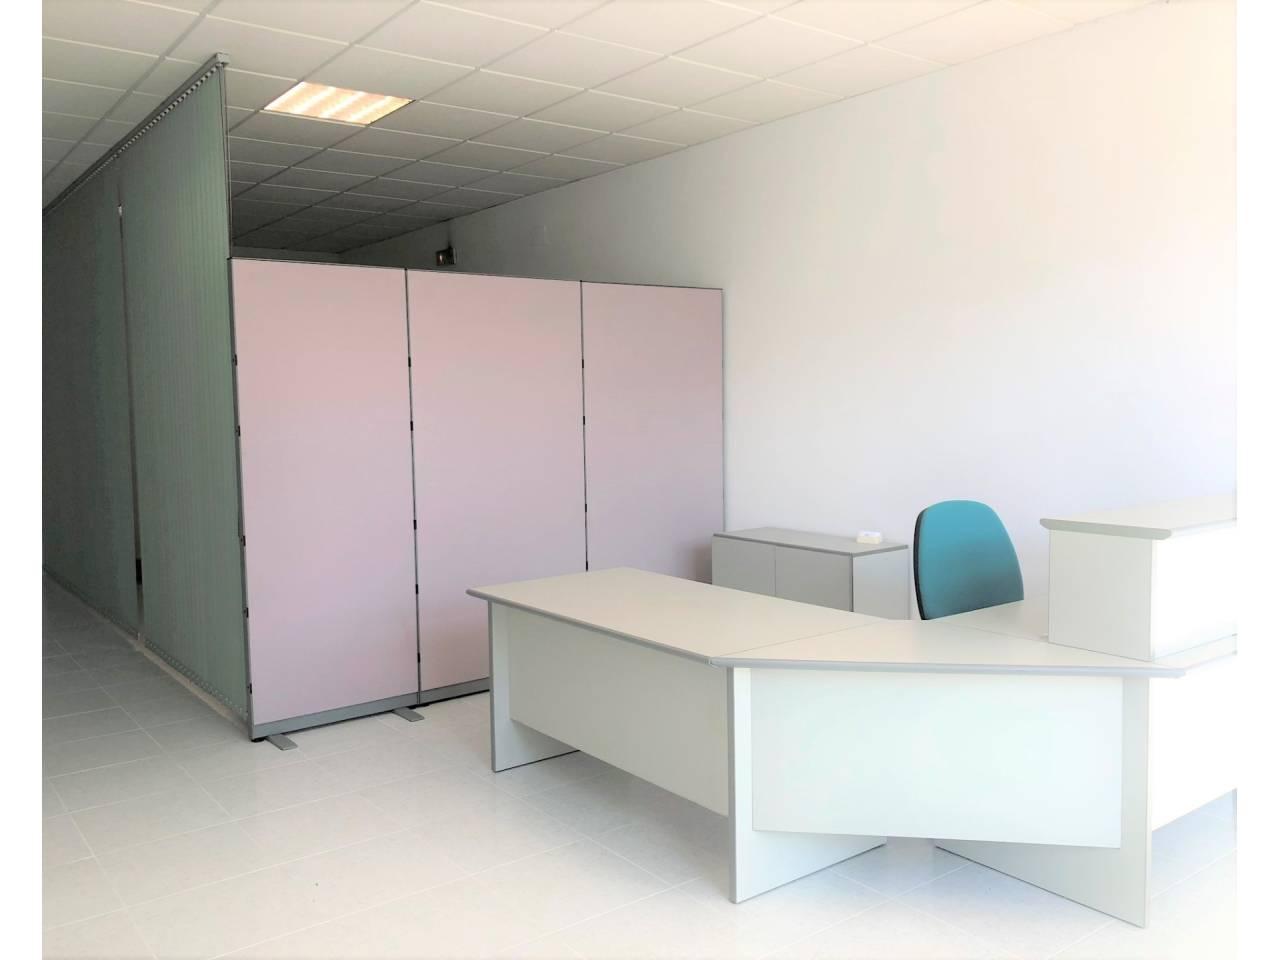 Lloguer Oficina  Calle francolí. Superficie total 200 m², oficina superficie útil 200 m², 1 aseo,